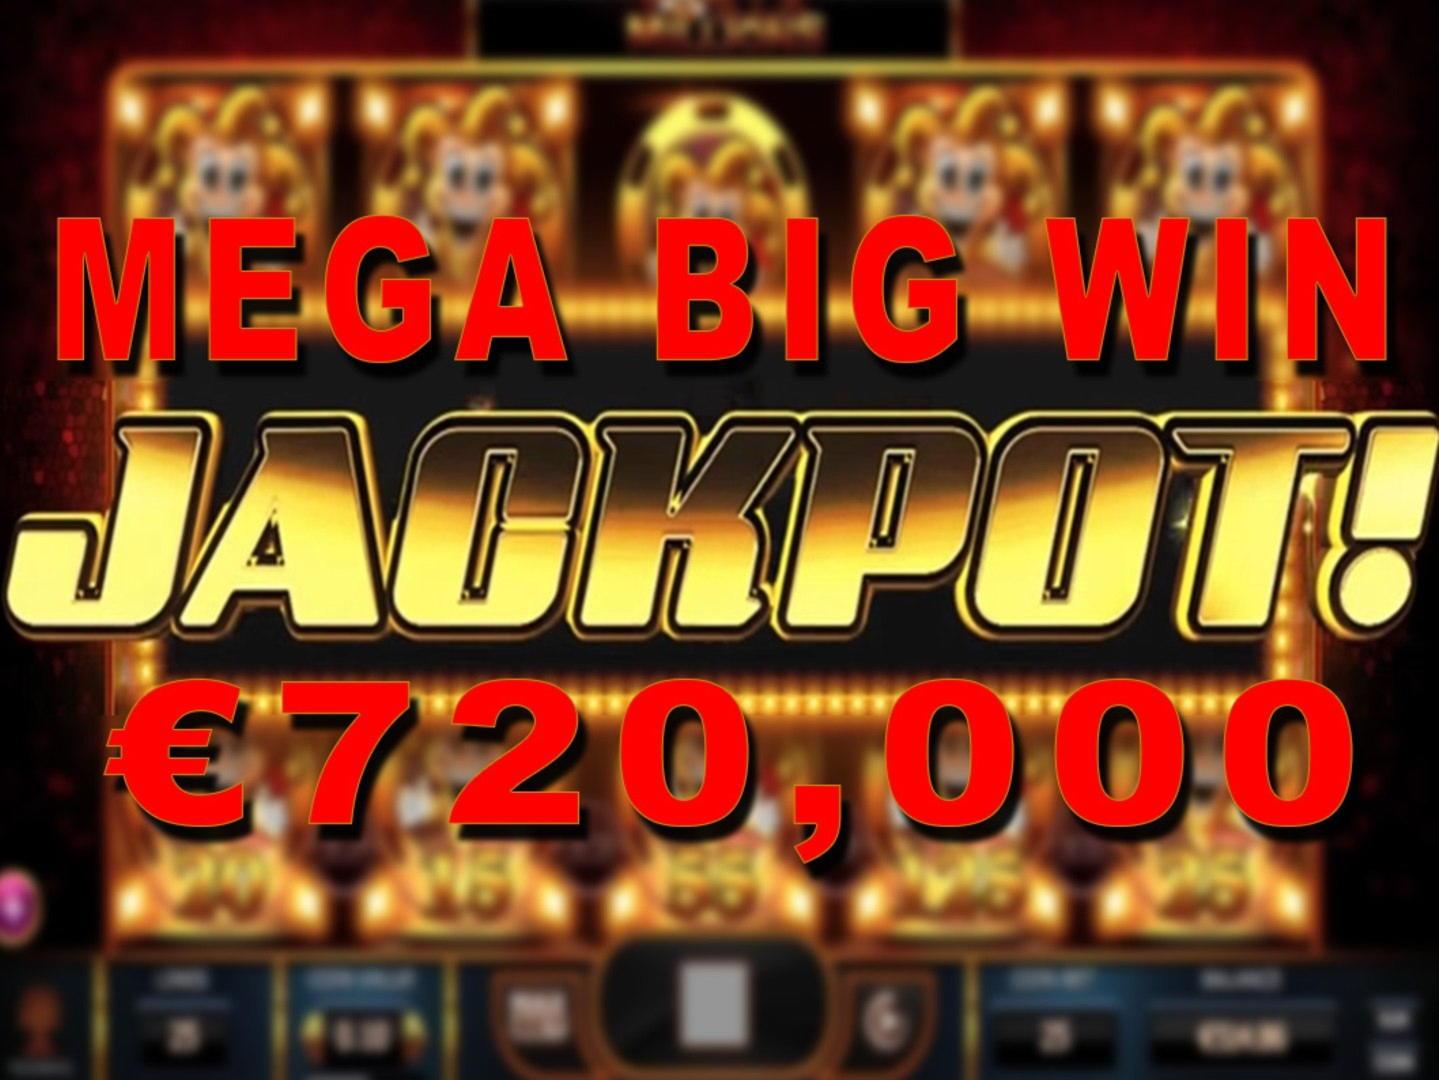 770% Casino Welcome Bonus at Flume Casino